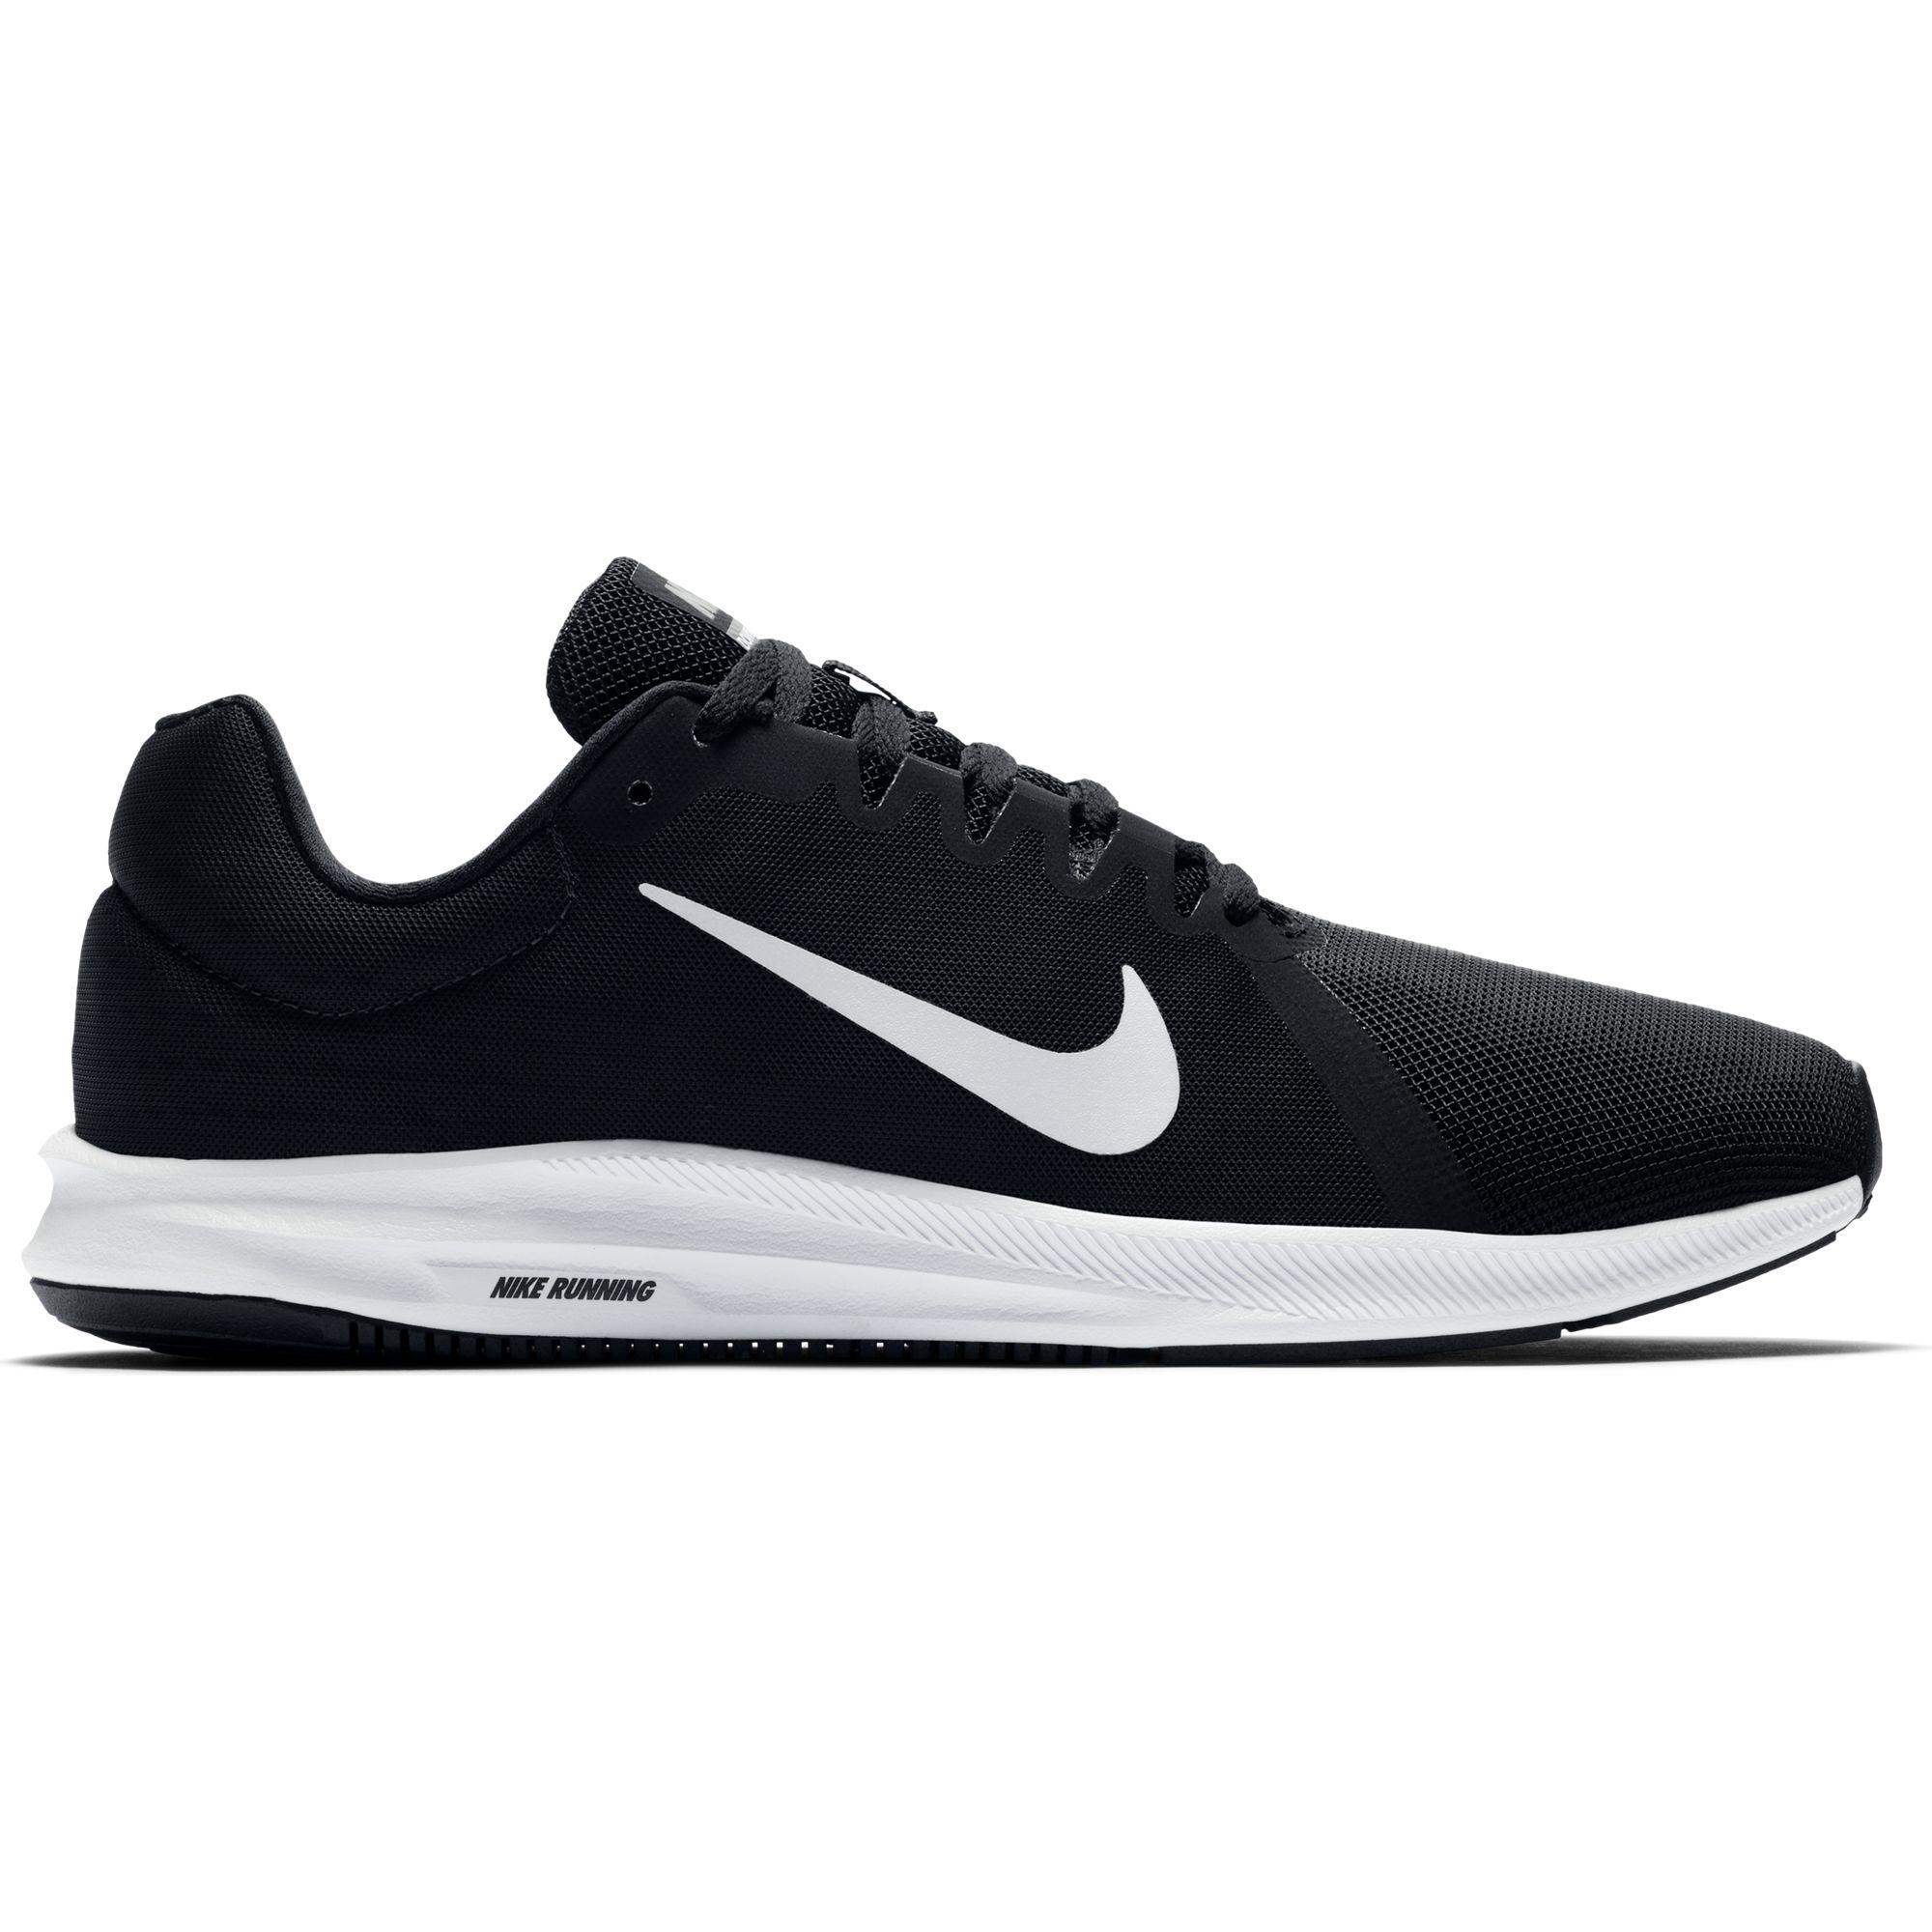 Details about Men's Nike Downshifter 8 Running Shoe